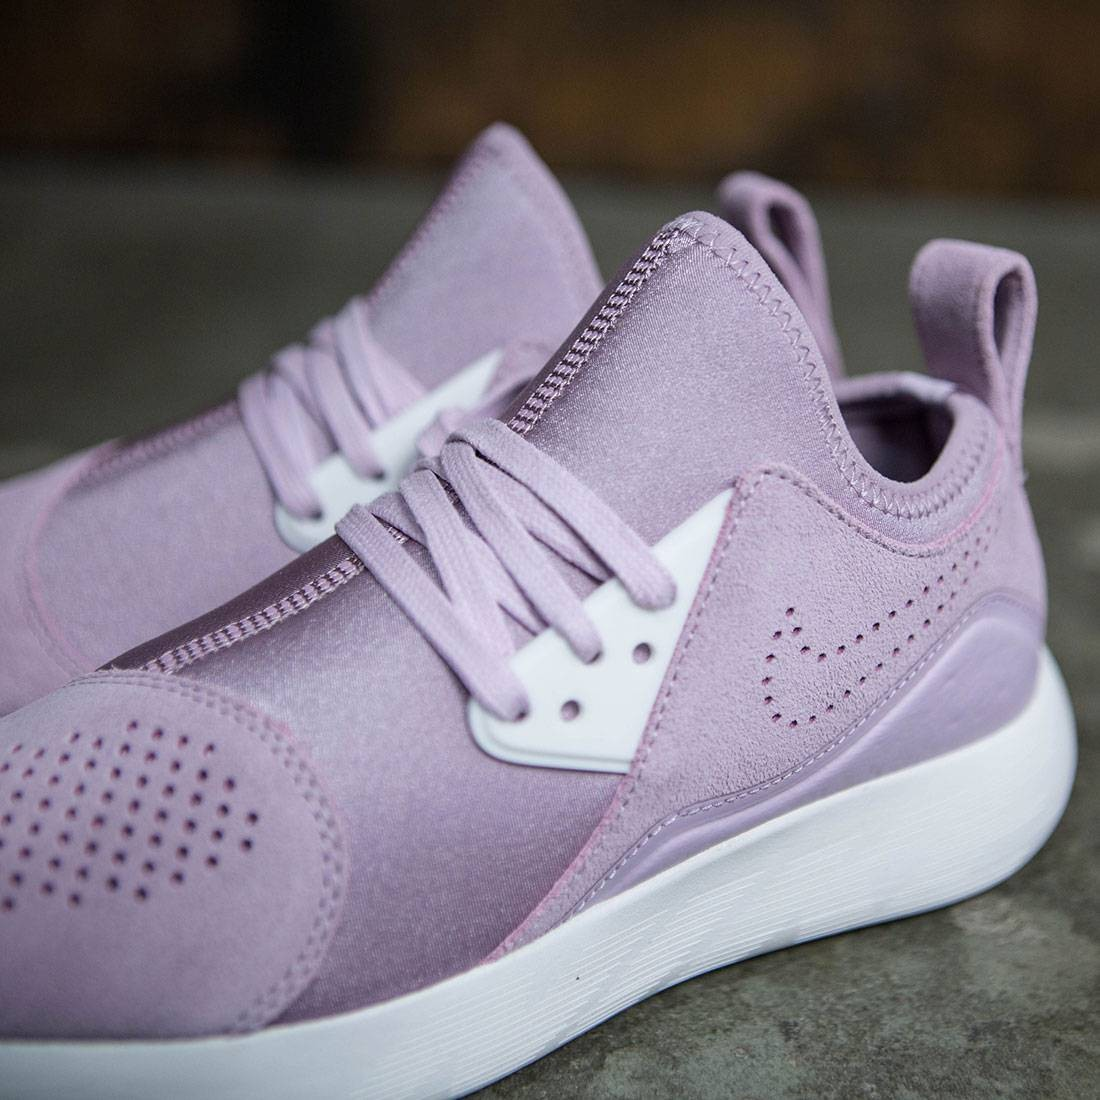 los angeles f7b14 7c526 Nike Women Wmns Nike Lunarcharge Premium (iced lilac   summit white-plum  fog-volt)